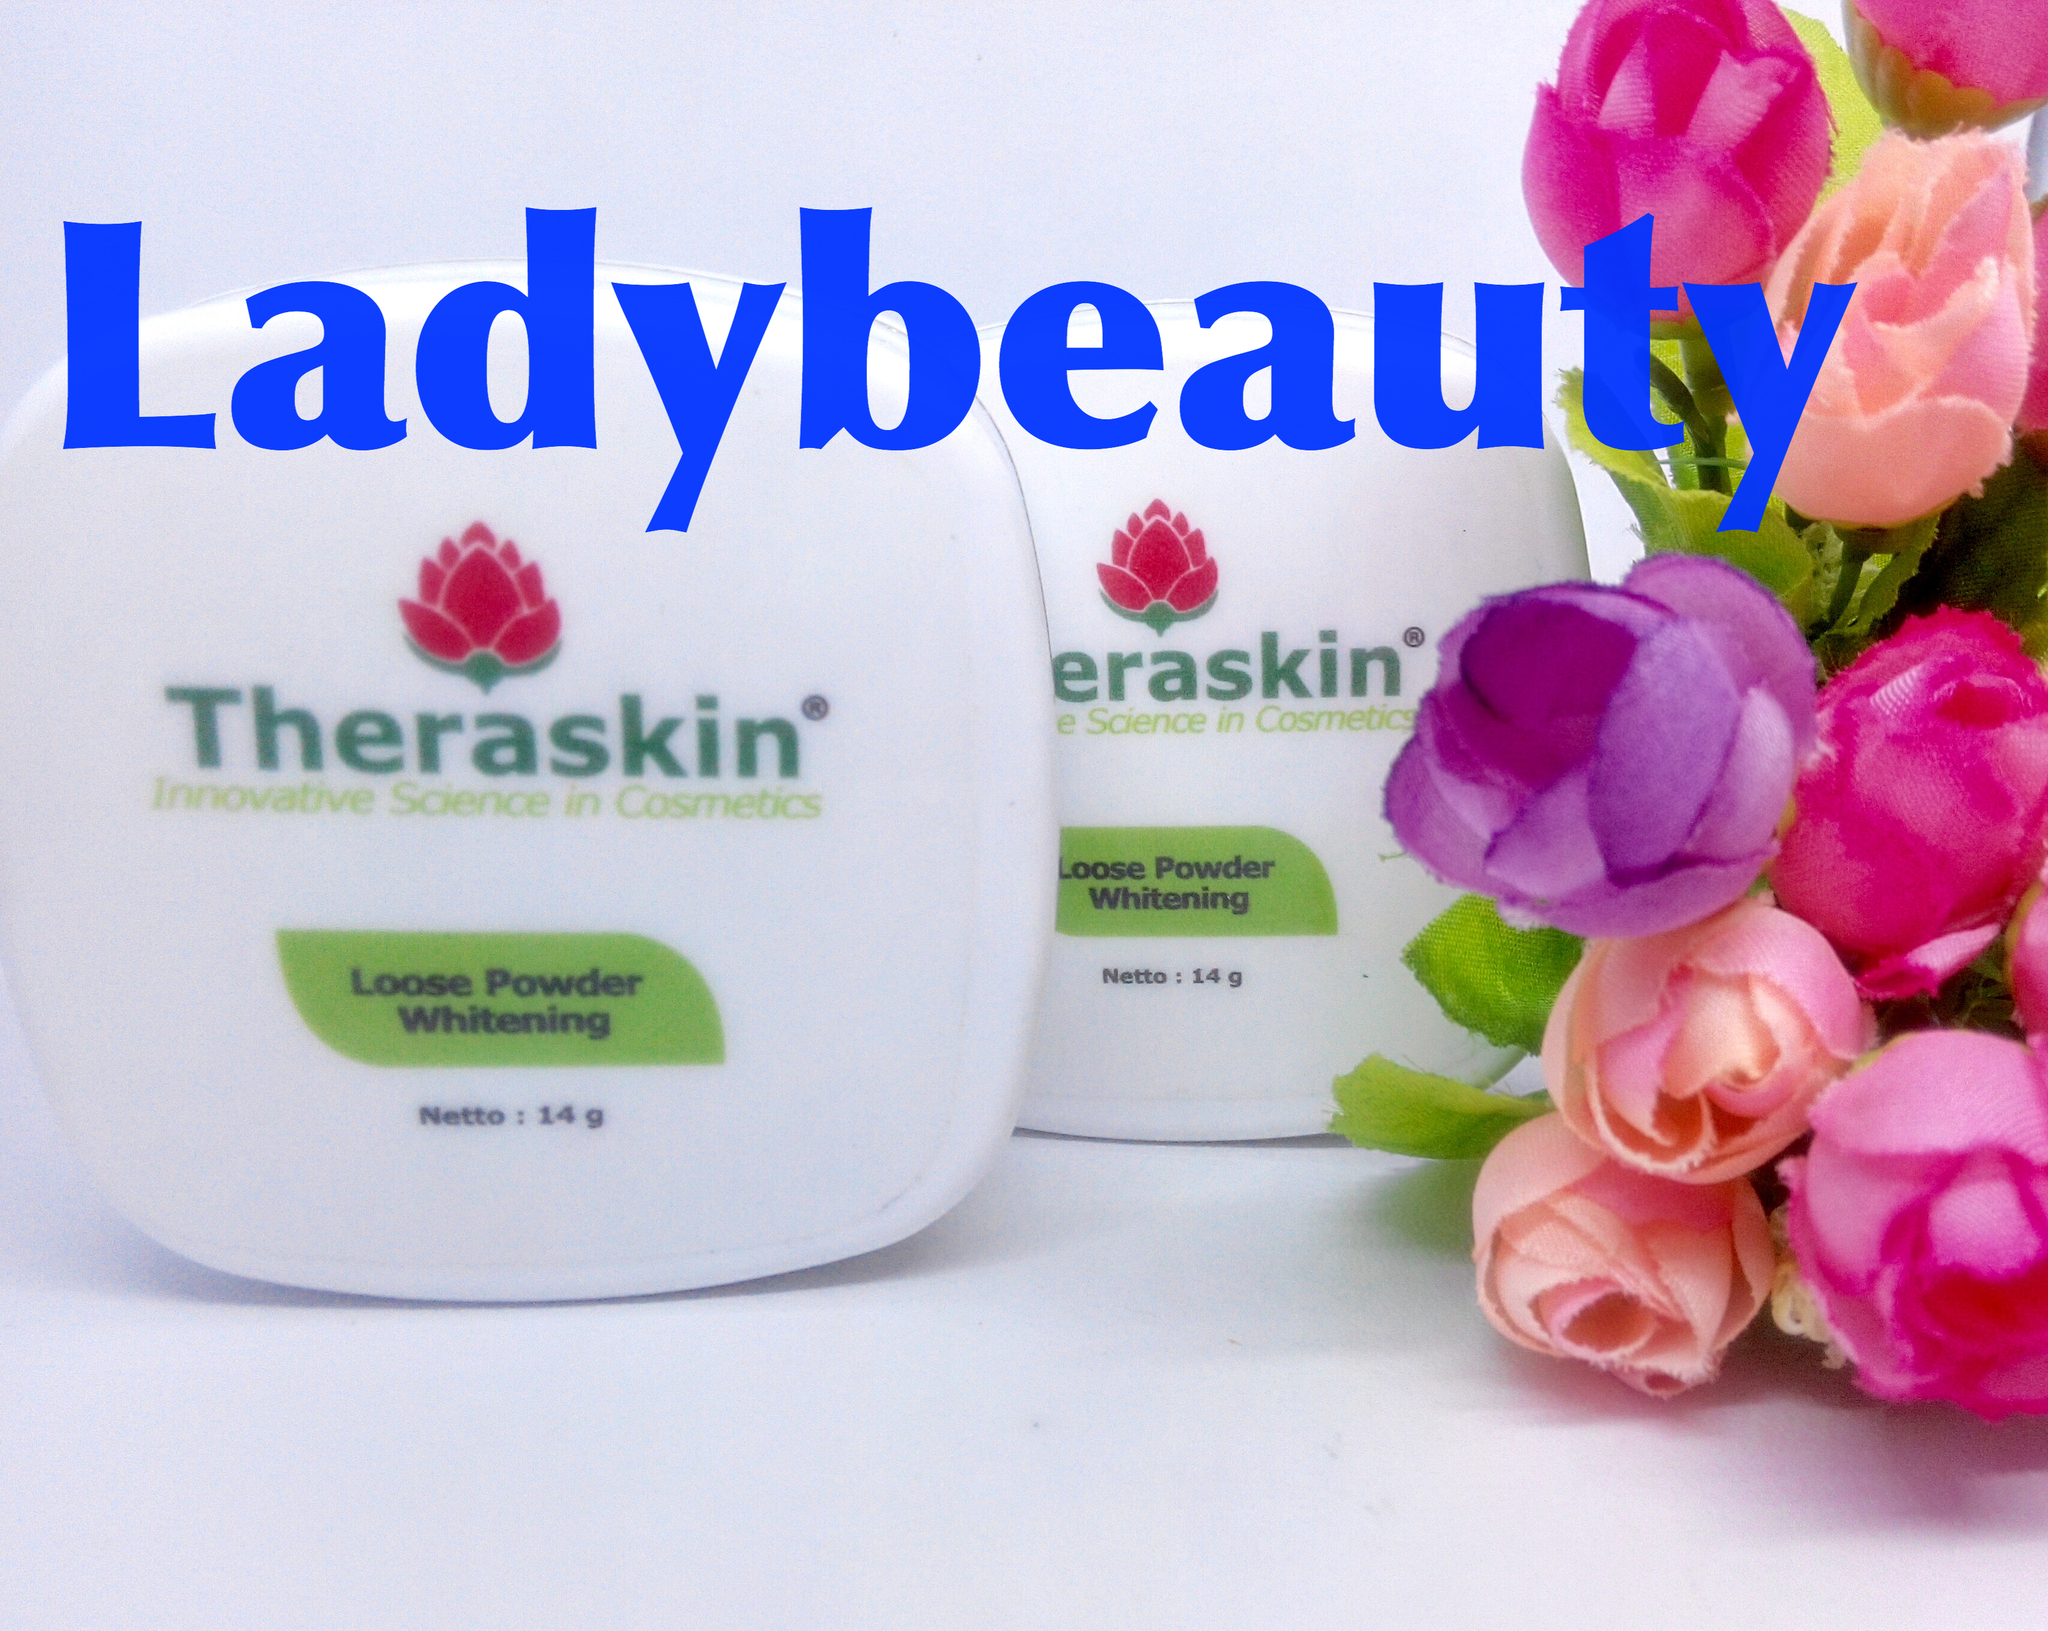 Jual Theraskin Loose Powder Whitening Bedak Tabur Plus Pemutih Ladybeauty Tokopedia